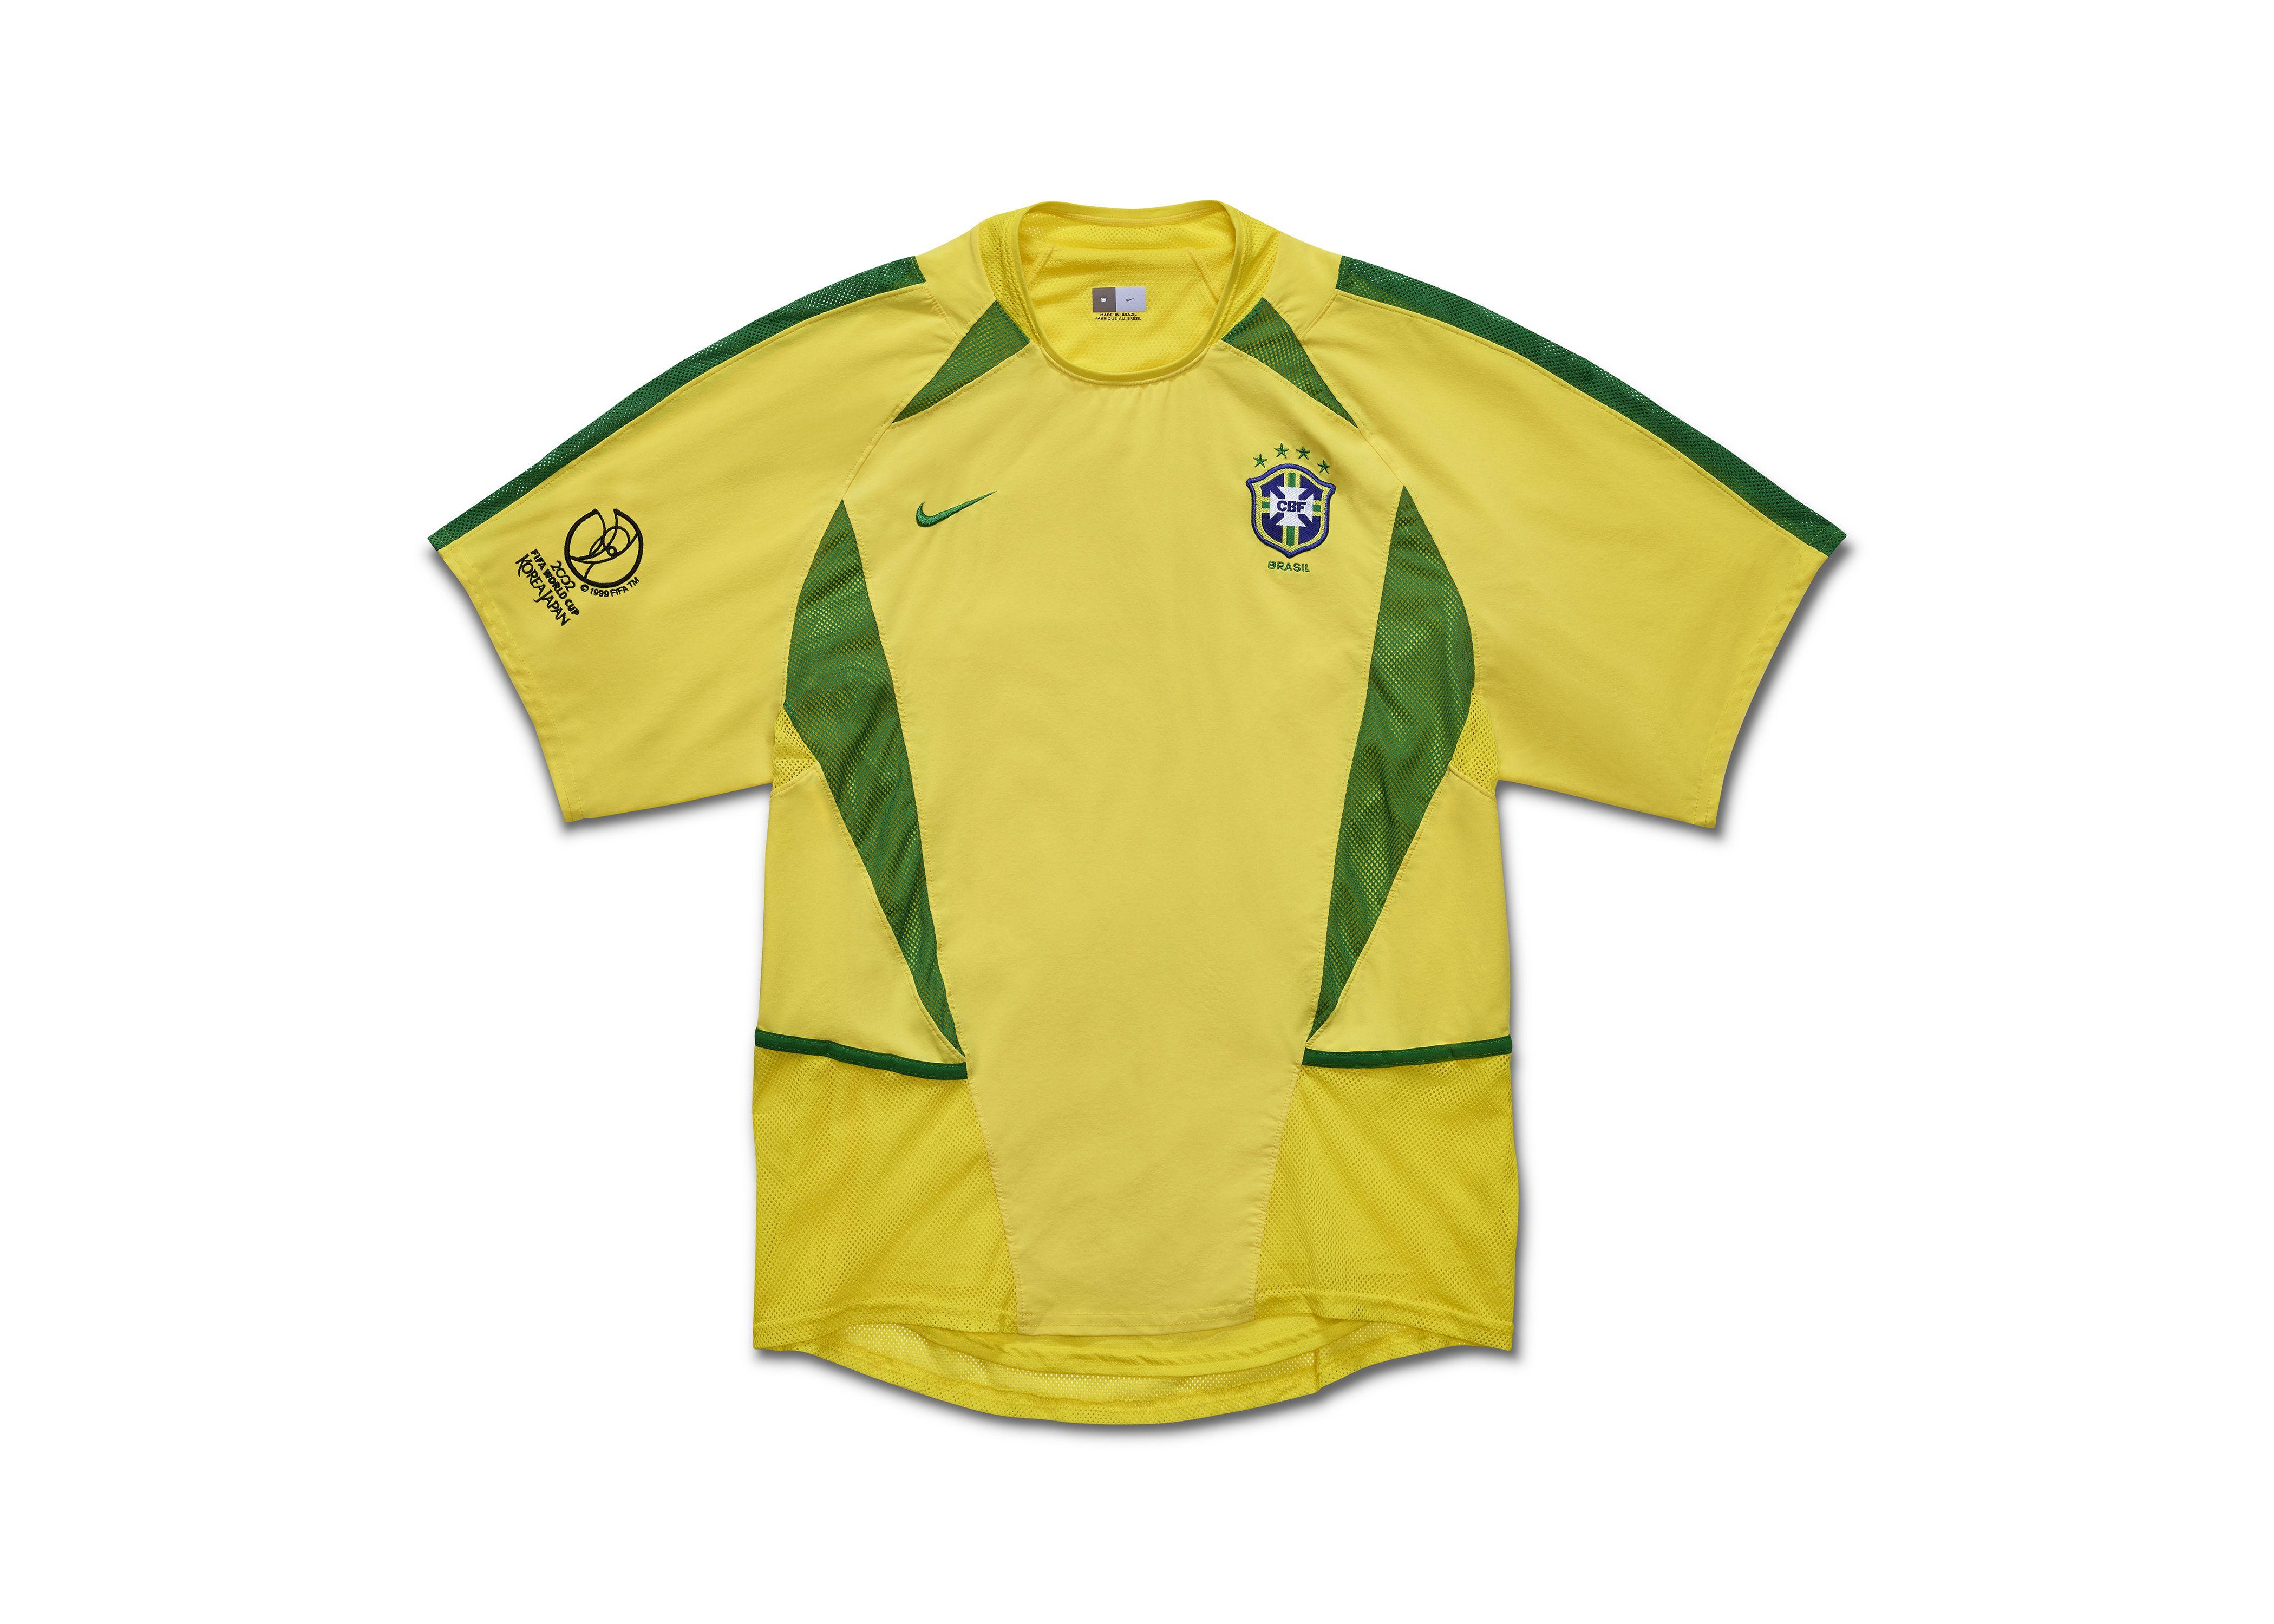 c86ecdc06b6 ... Football Kits by Angelo Trofa. Brazil World Cup 2002 home Nike